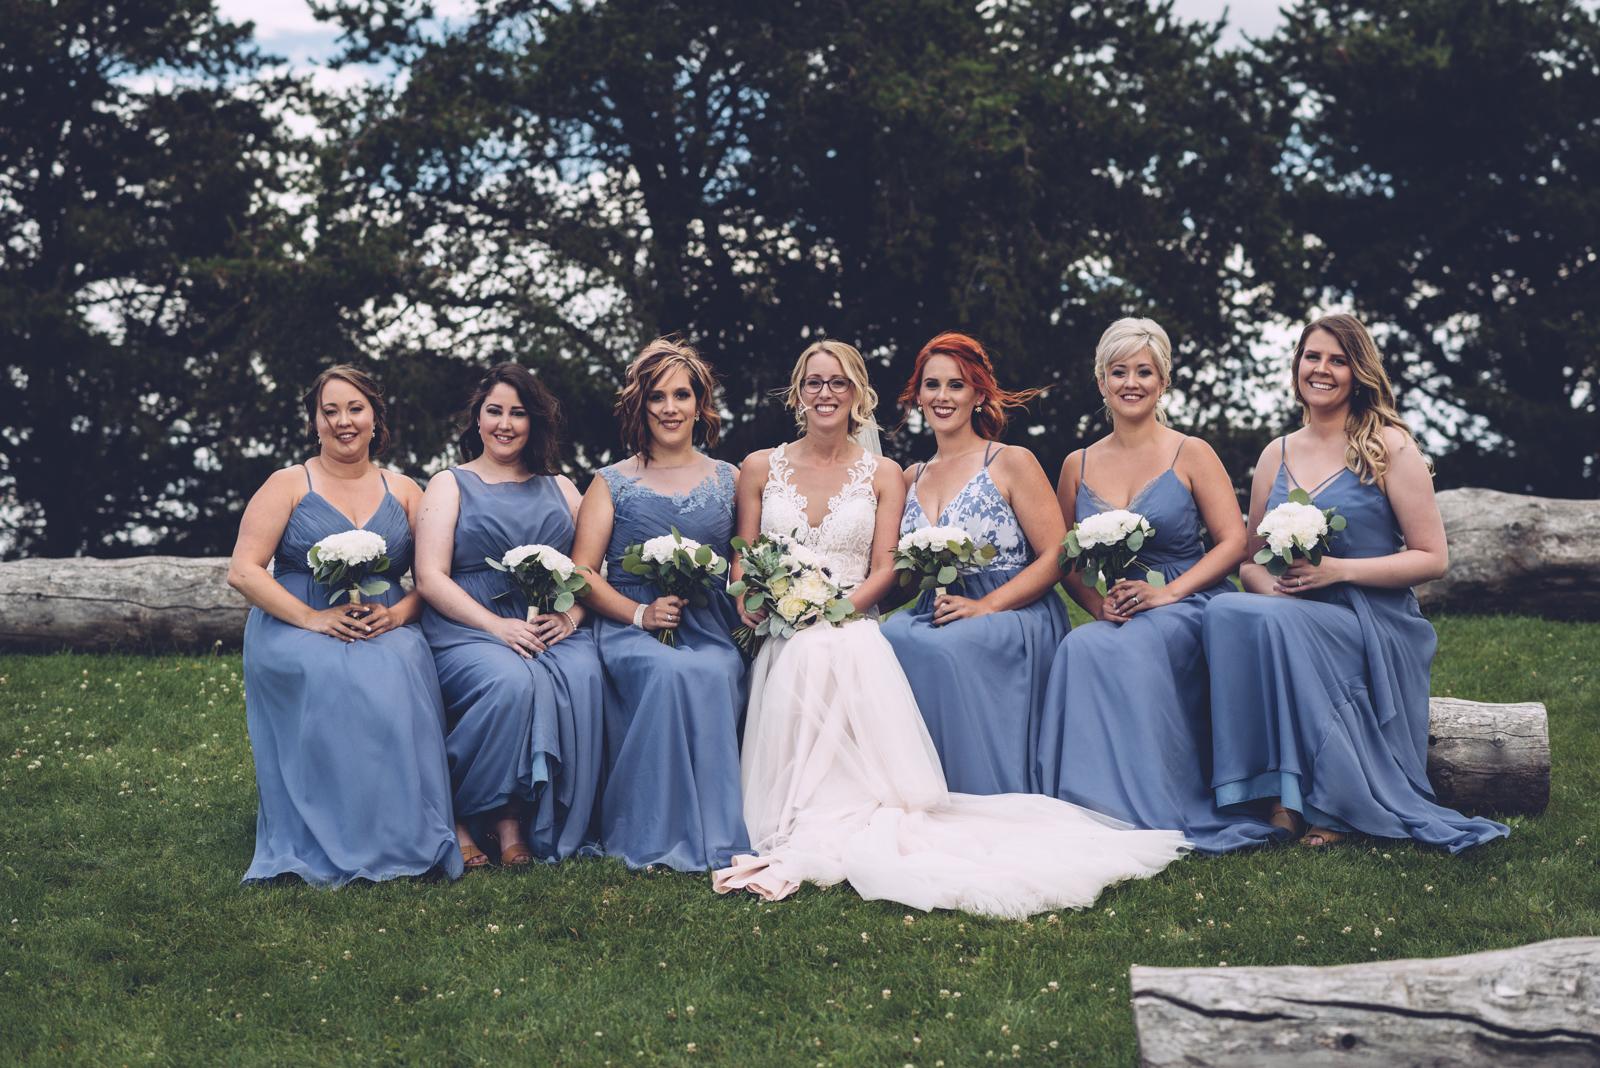 jessica_jonathon_wedding_blog57.jpg